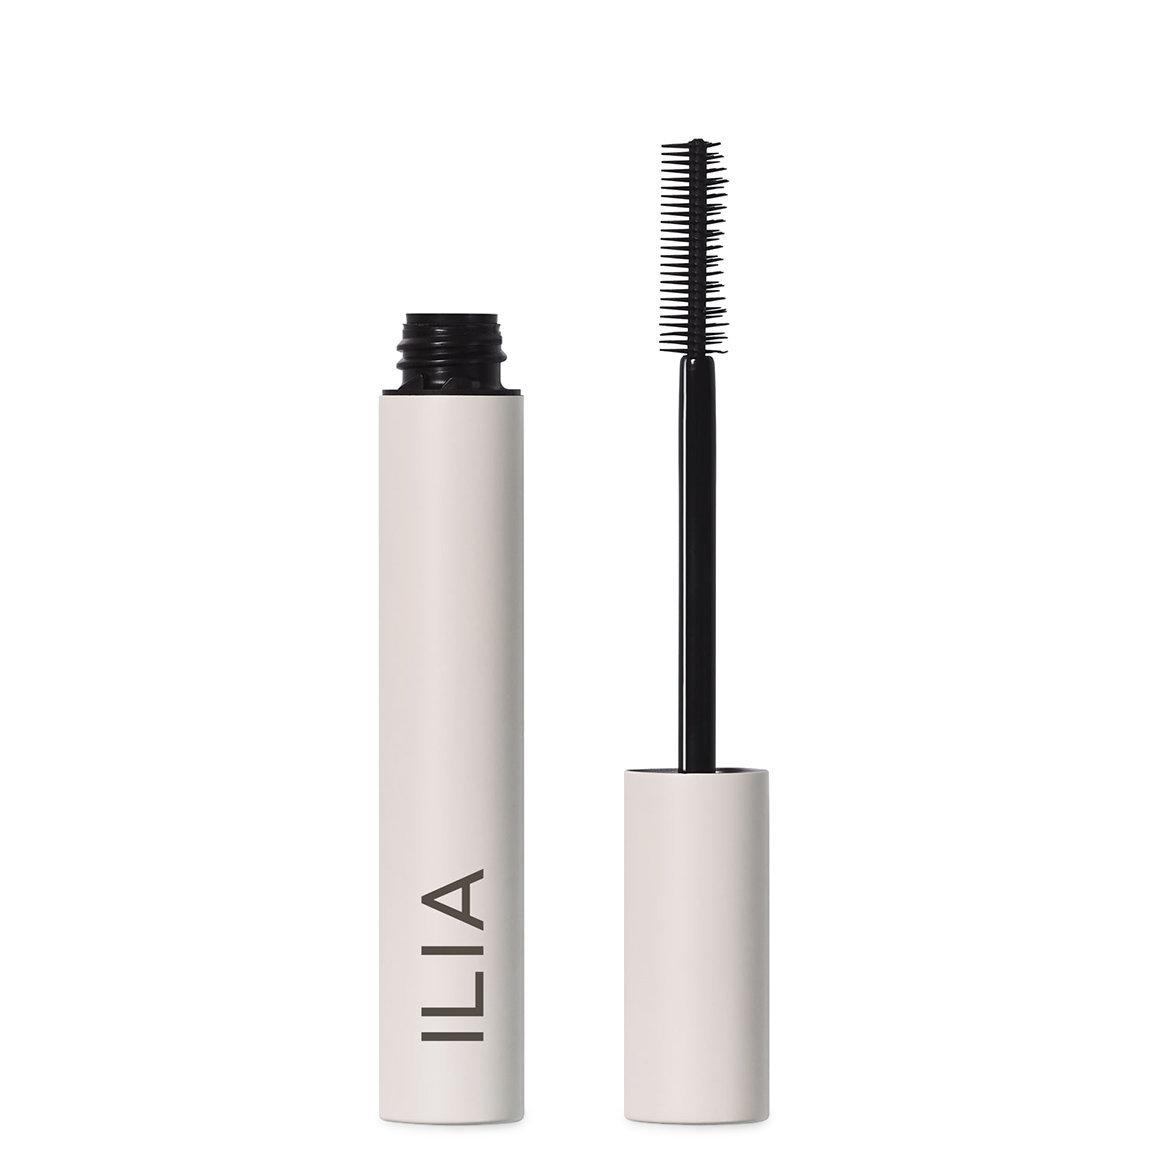 ILIA Limitless Lash Mascara alternative view 1 - product swatch.